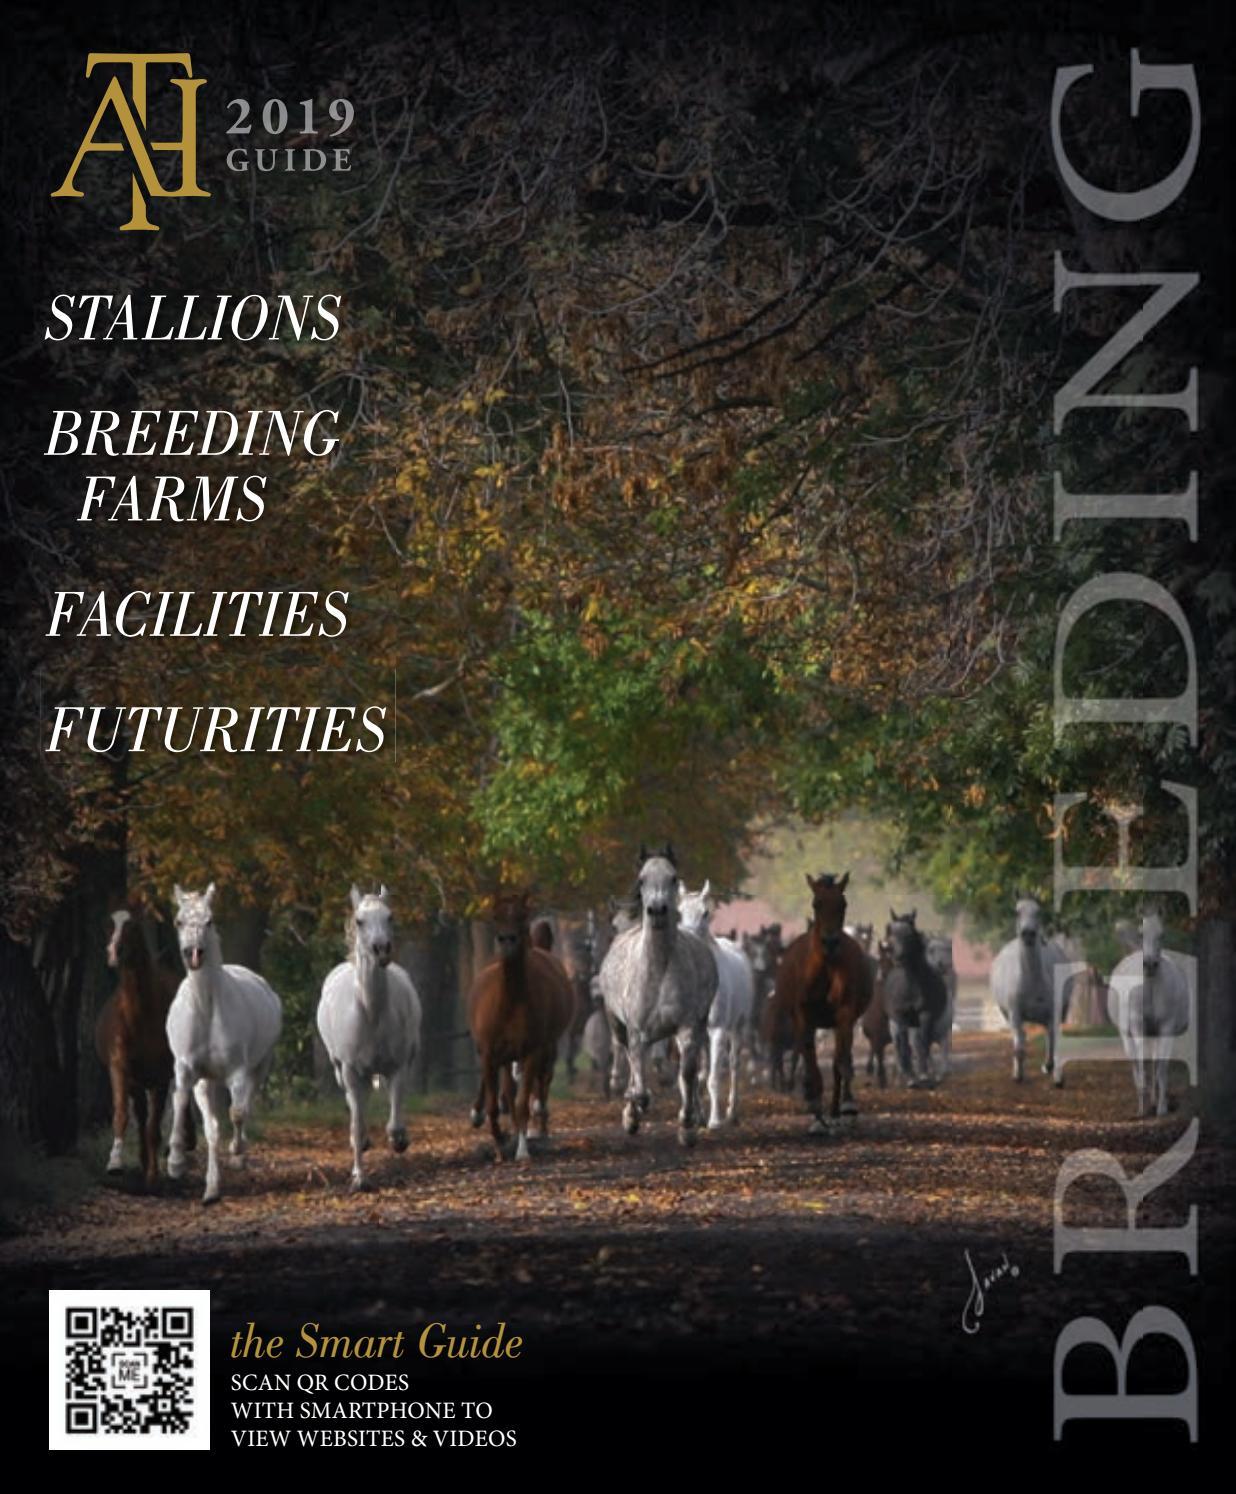 2019 Aht Breeding Guide Published In Arabian Horse Times By Arabian Horse Times Issuu